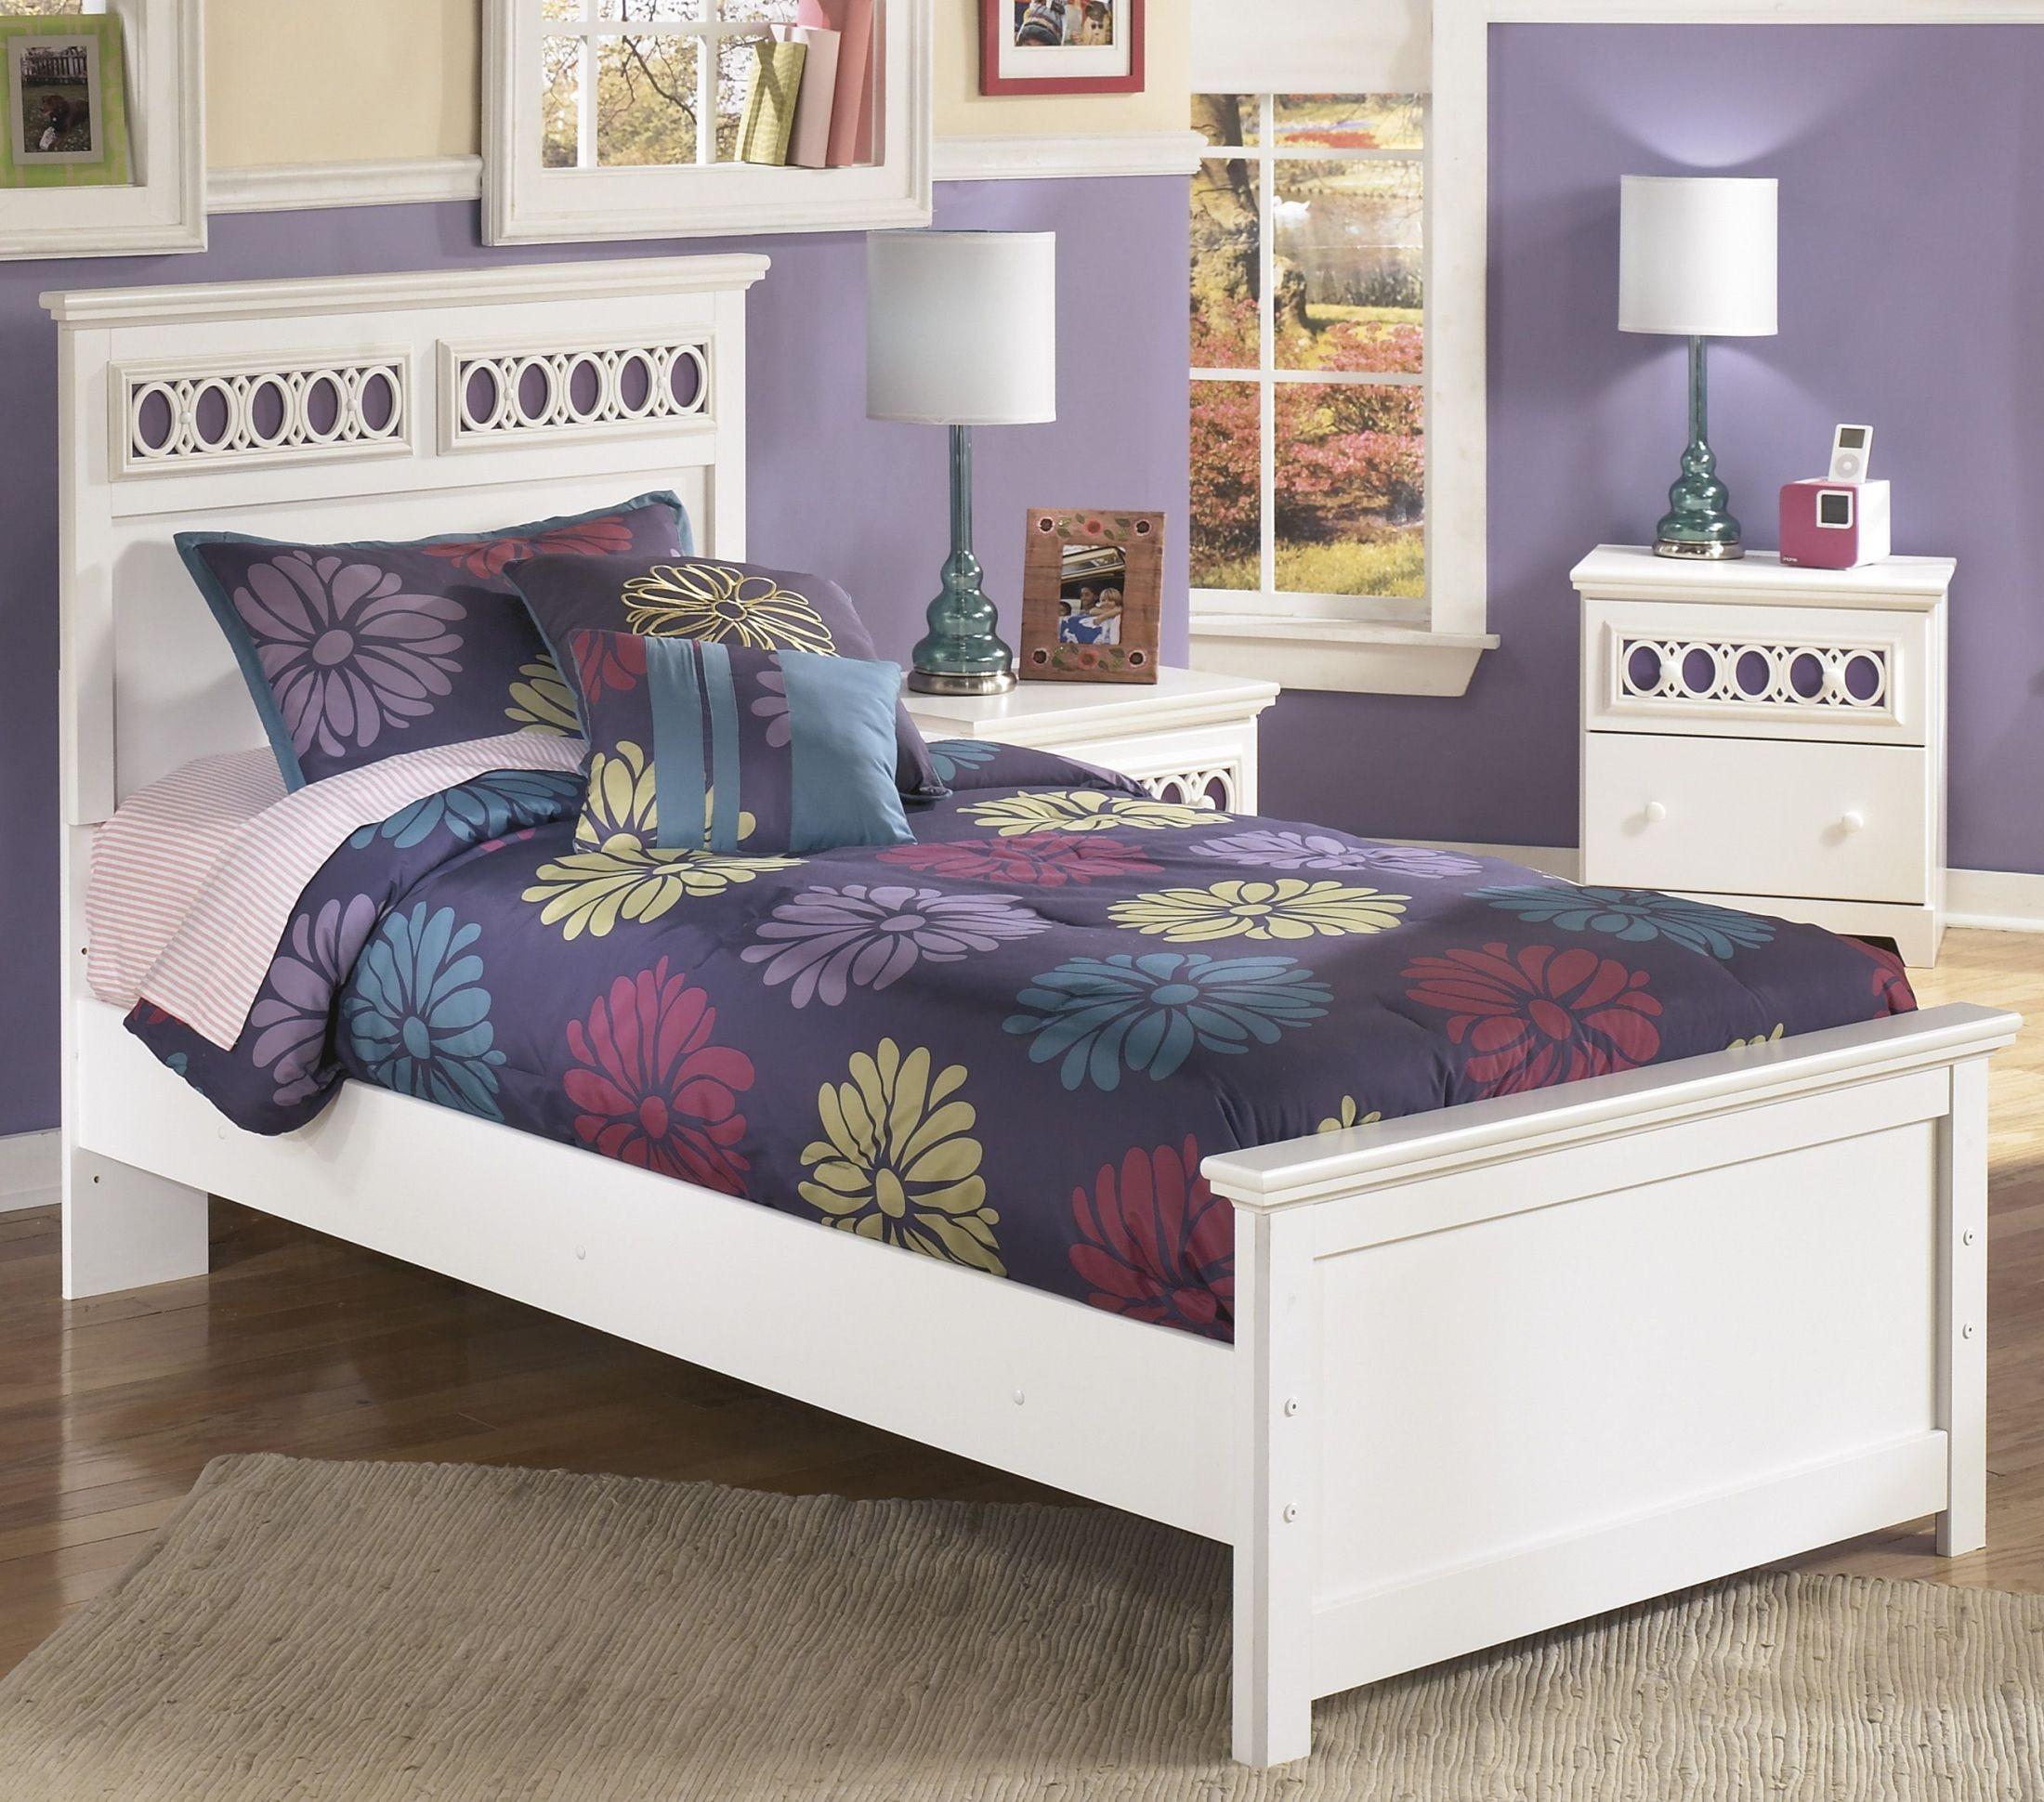 Zayley Bedroom Set 28 Images Zayley Bookcase Bedroom Set B131 85 51 82 Signature Design By